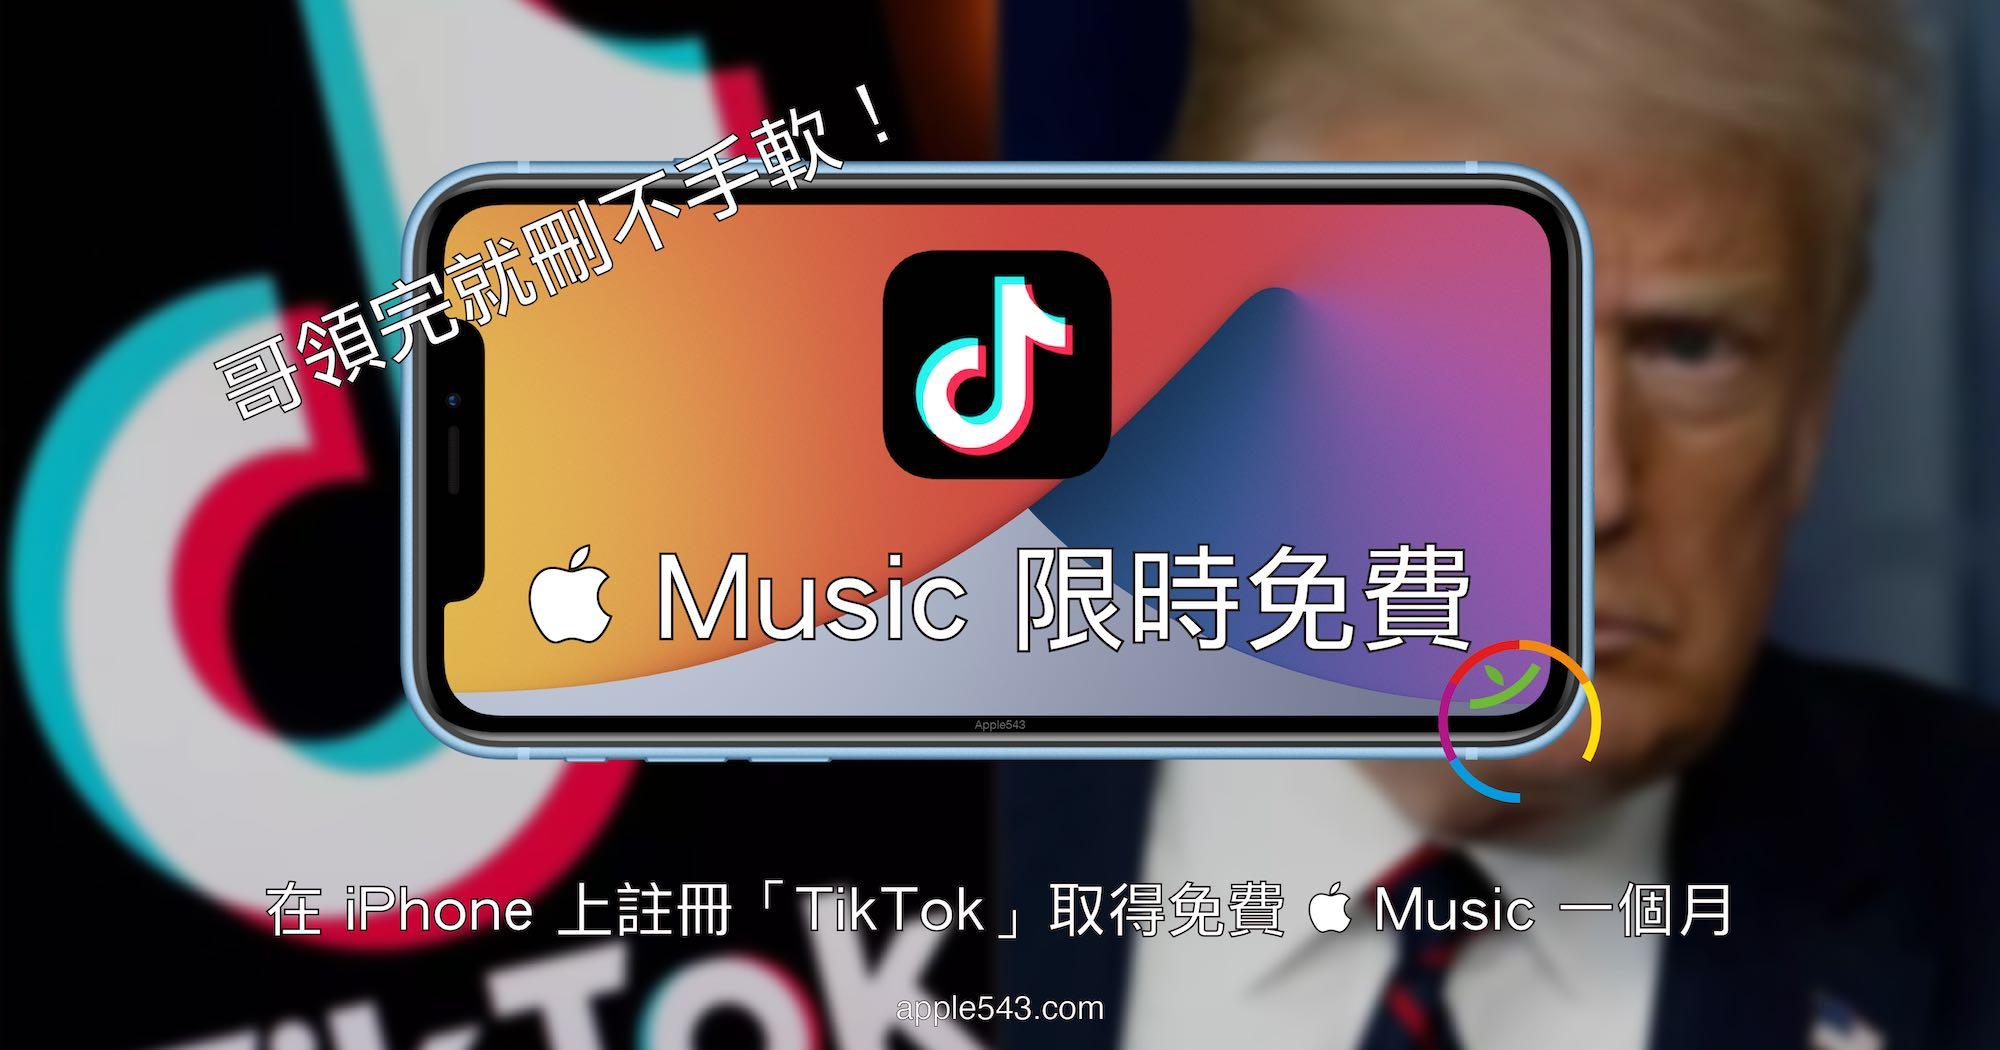 Apple Music 限時免費